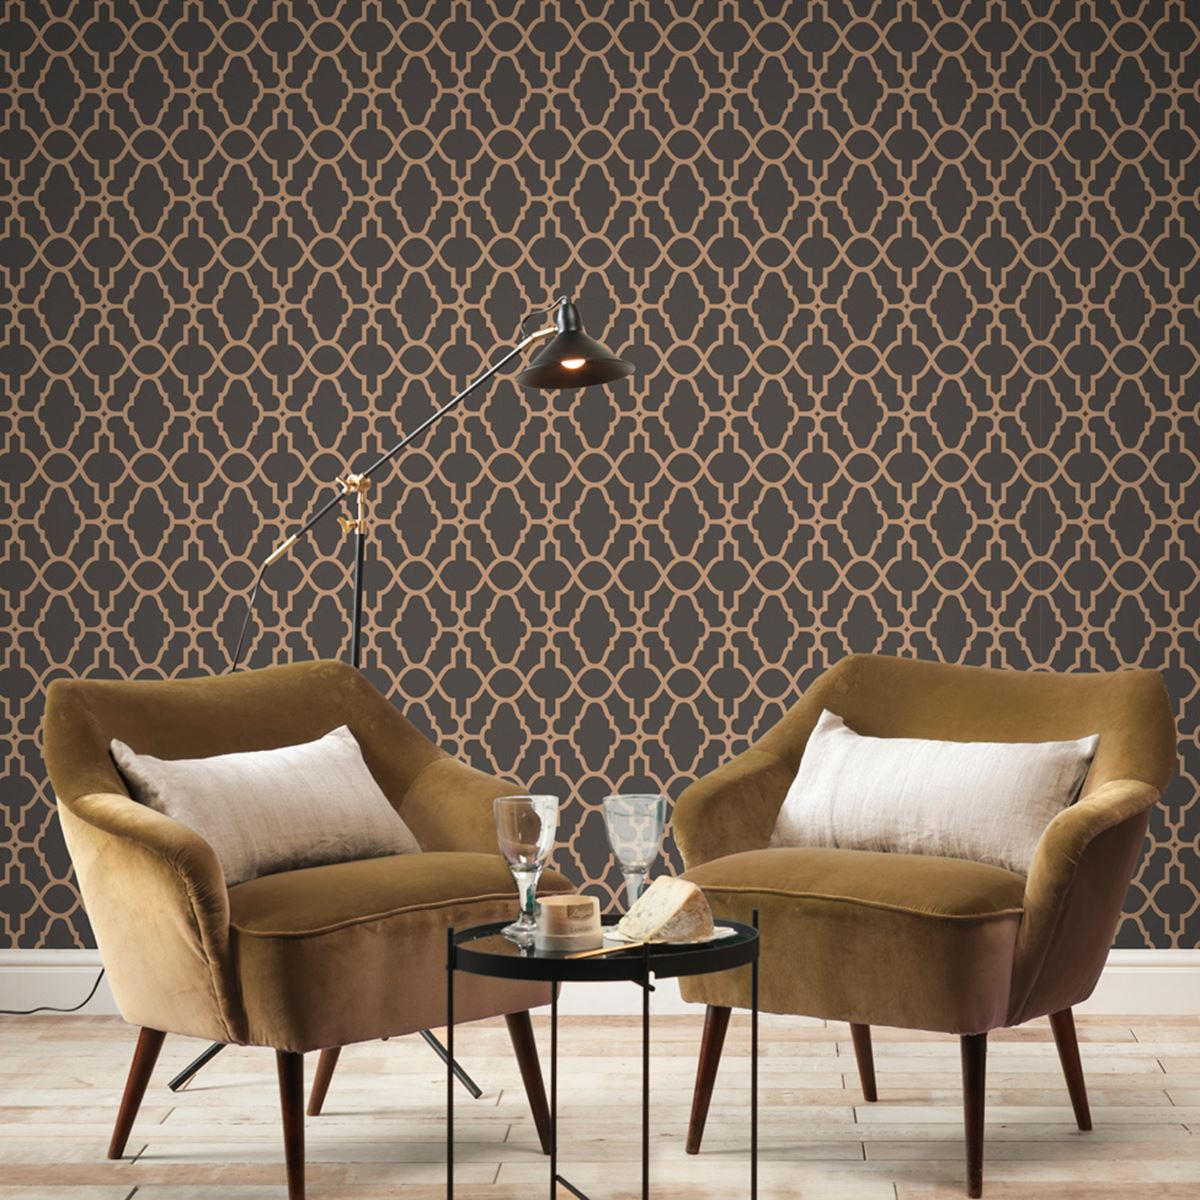 Apex Trellis Sidewall Wallpaper Copper: GEOMETRIC WALLPAPER MODERN DECOR TRIANGLES TRELLIS SILVER